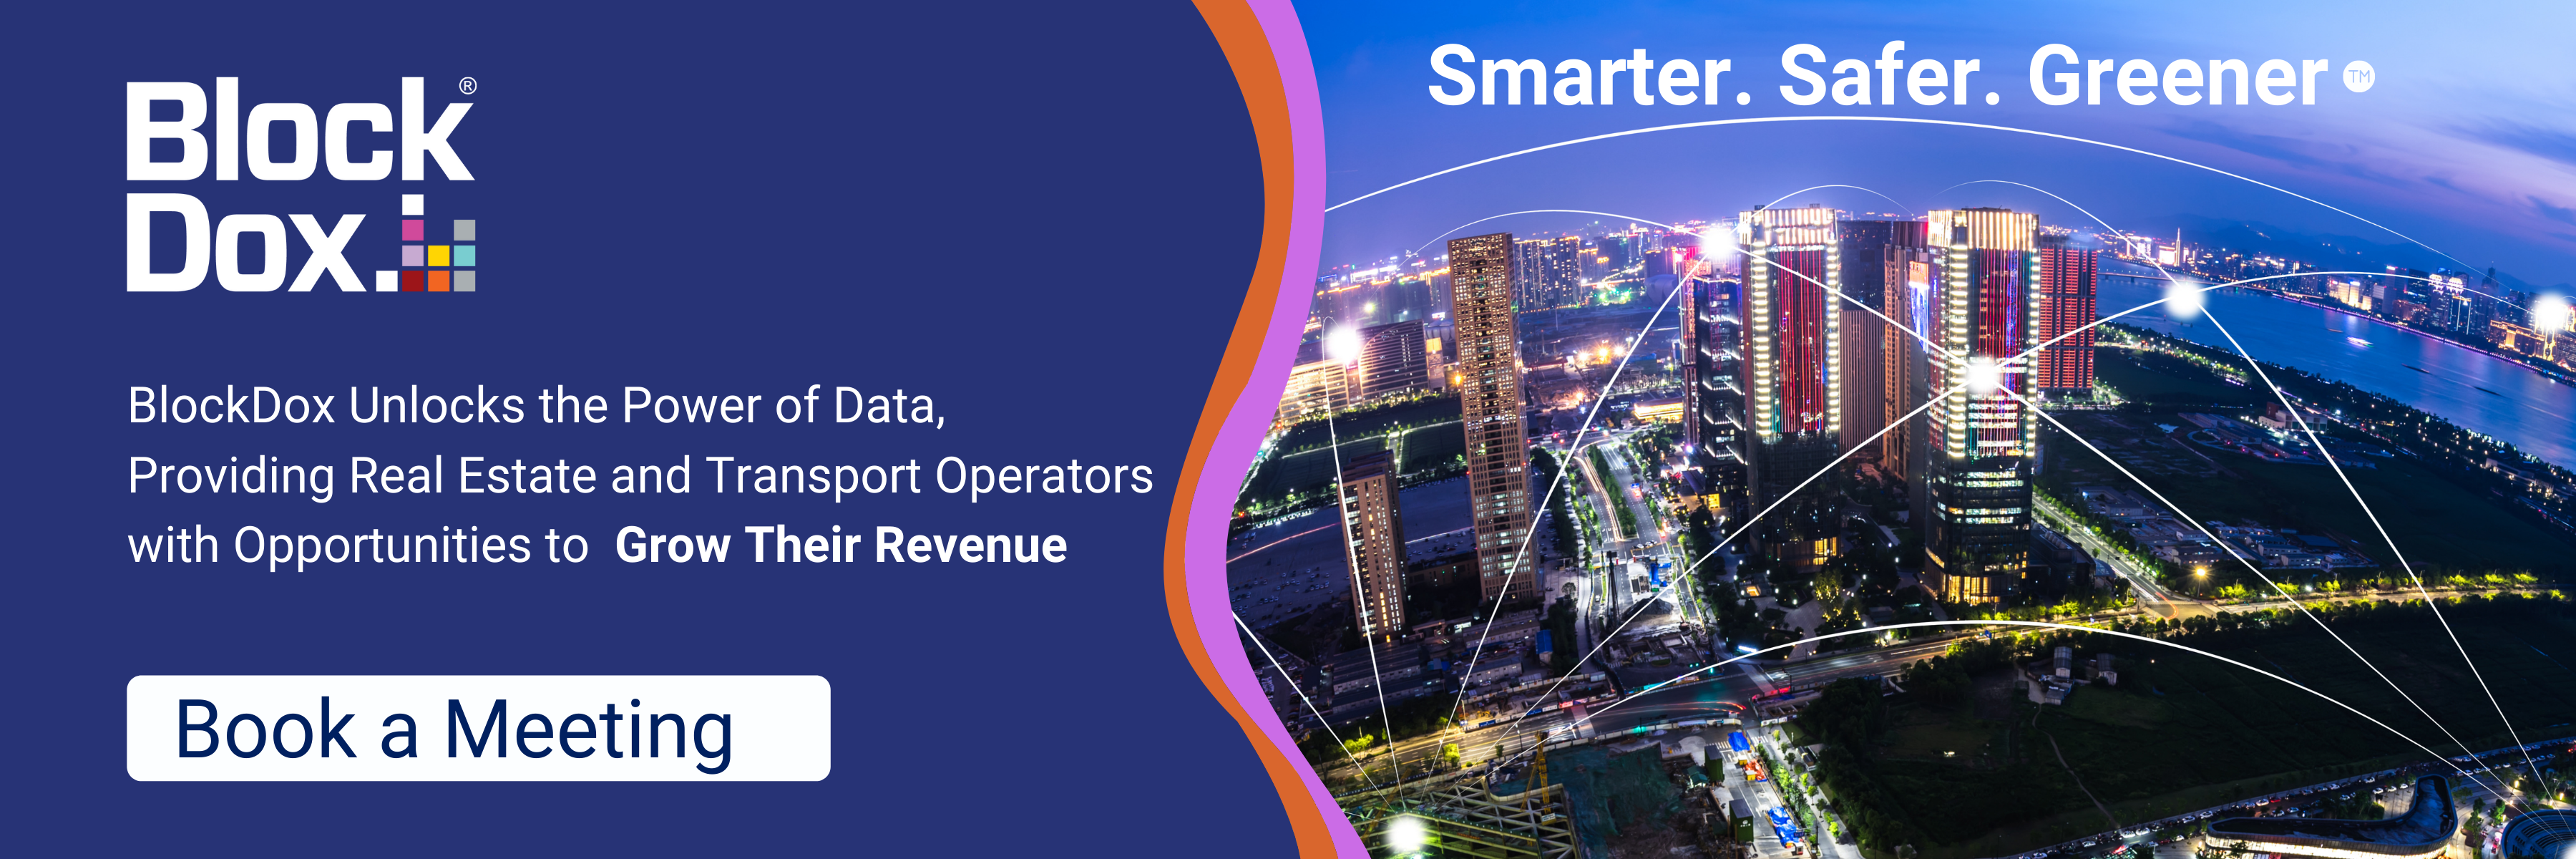 Data analytics, Smart buildind, saving energy, BMS, covid